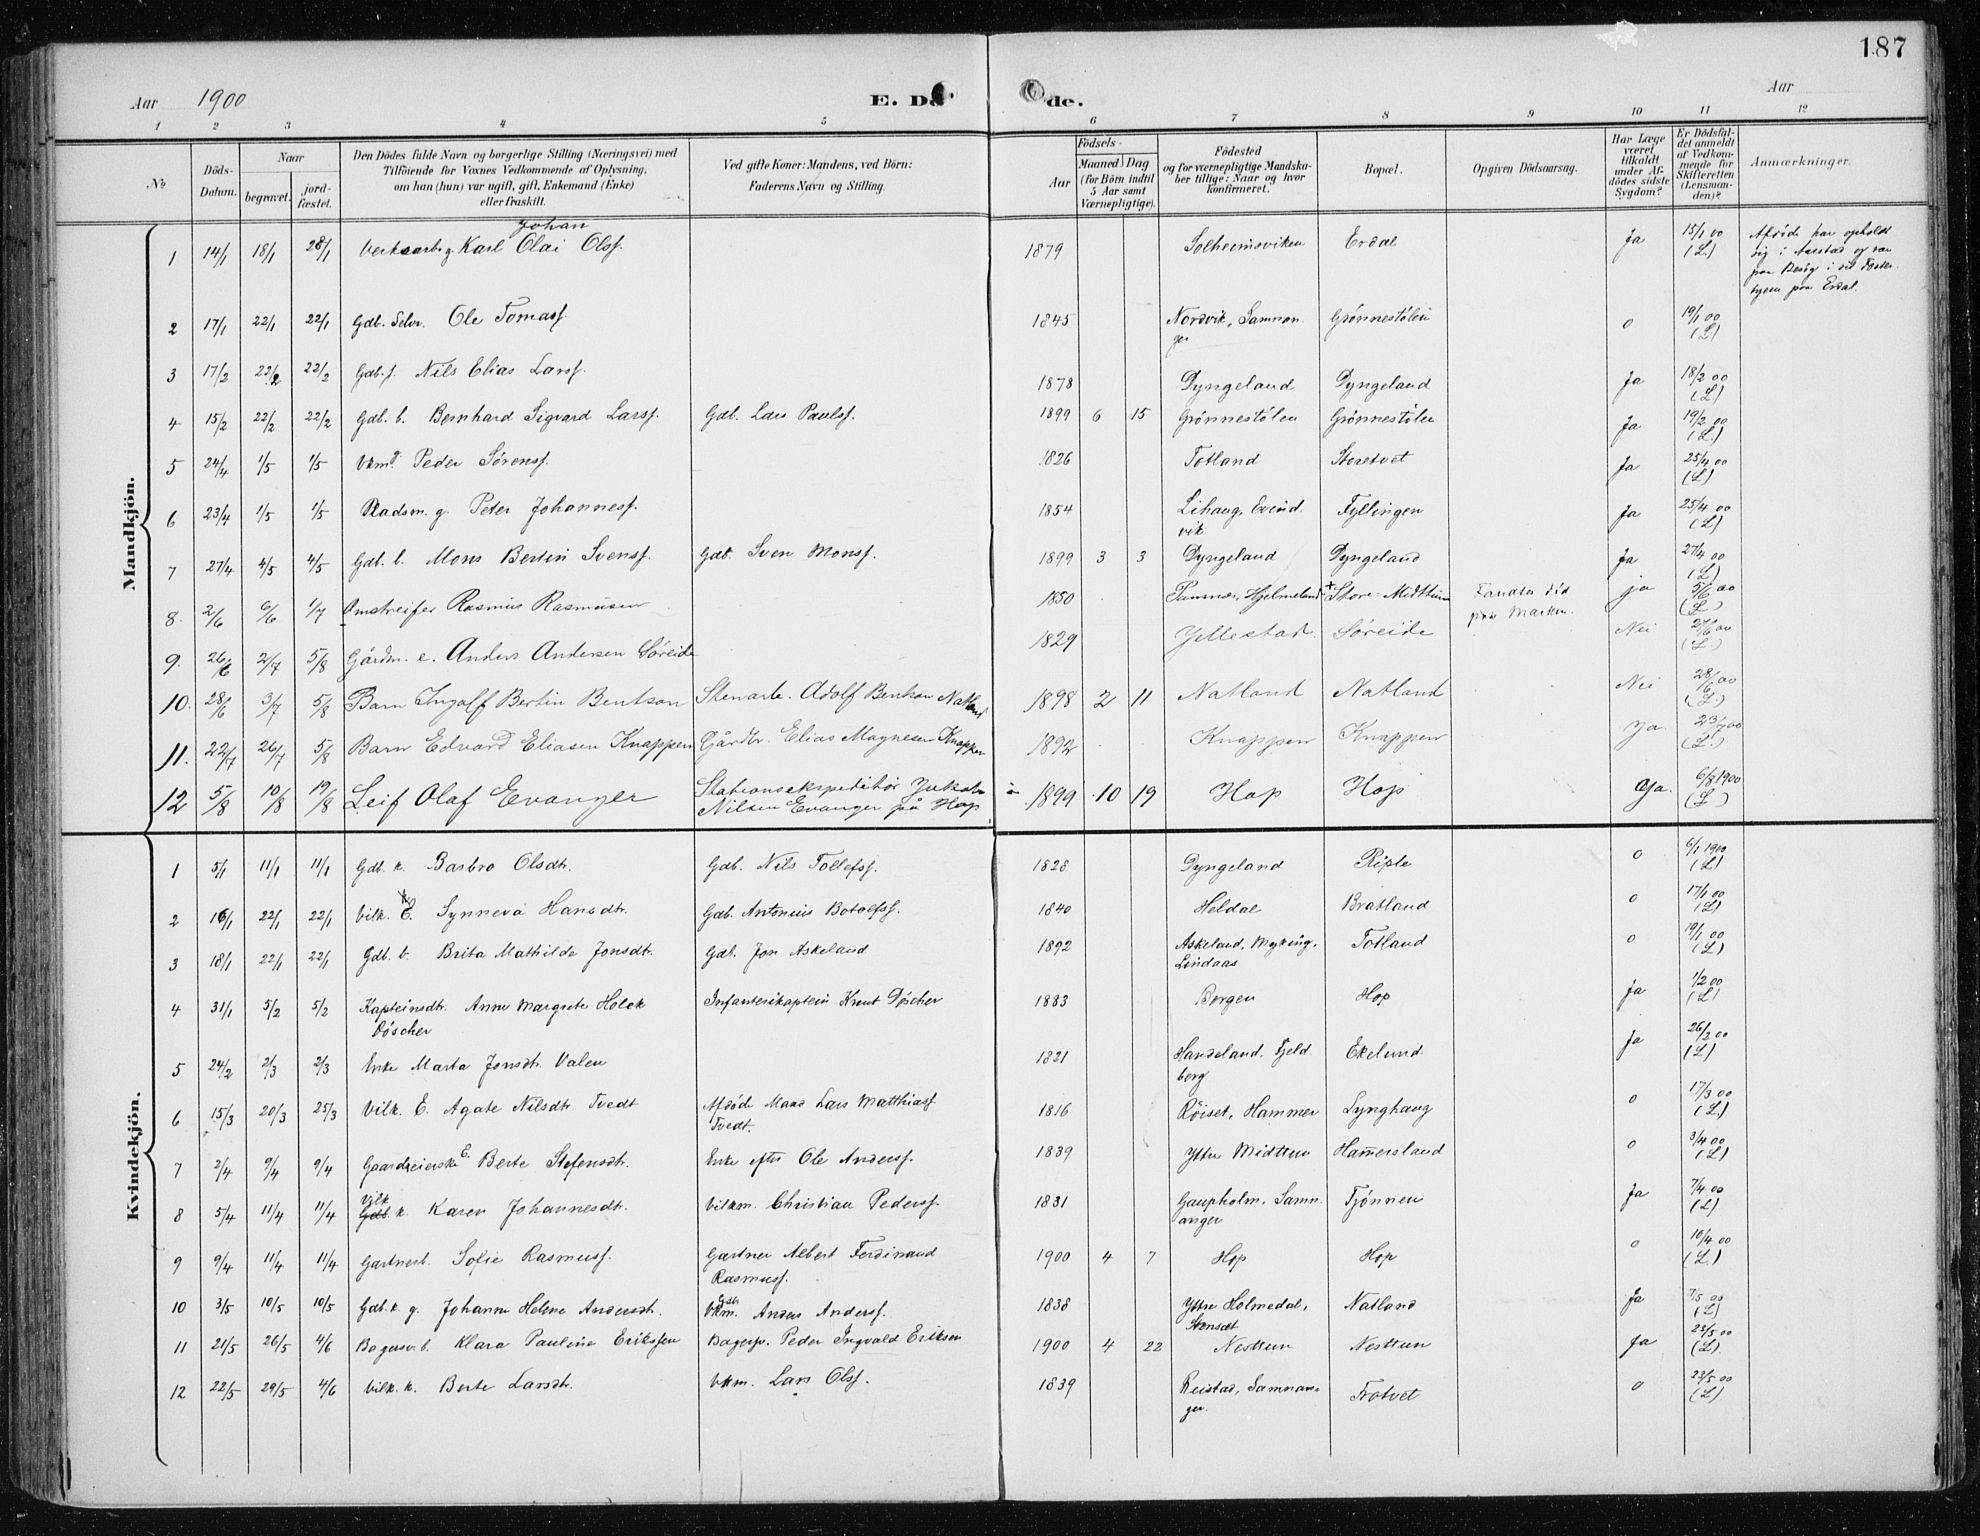 SAB, Fana Sokneprestembete, H/Haa/Haai/L0003: Ministerialbok nr. I 3, 1900-1912, s. 187